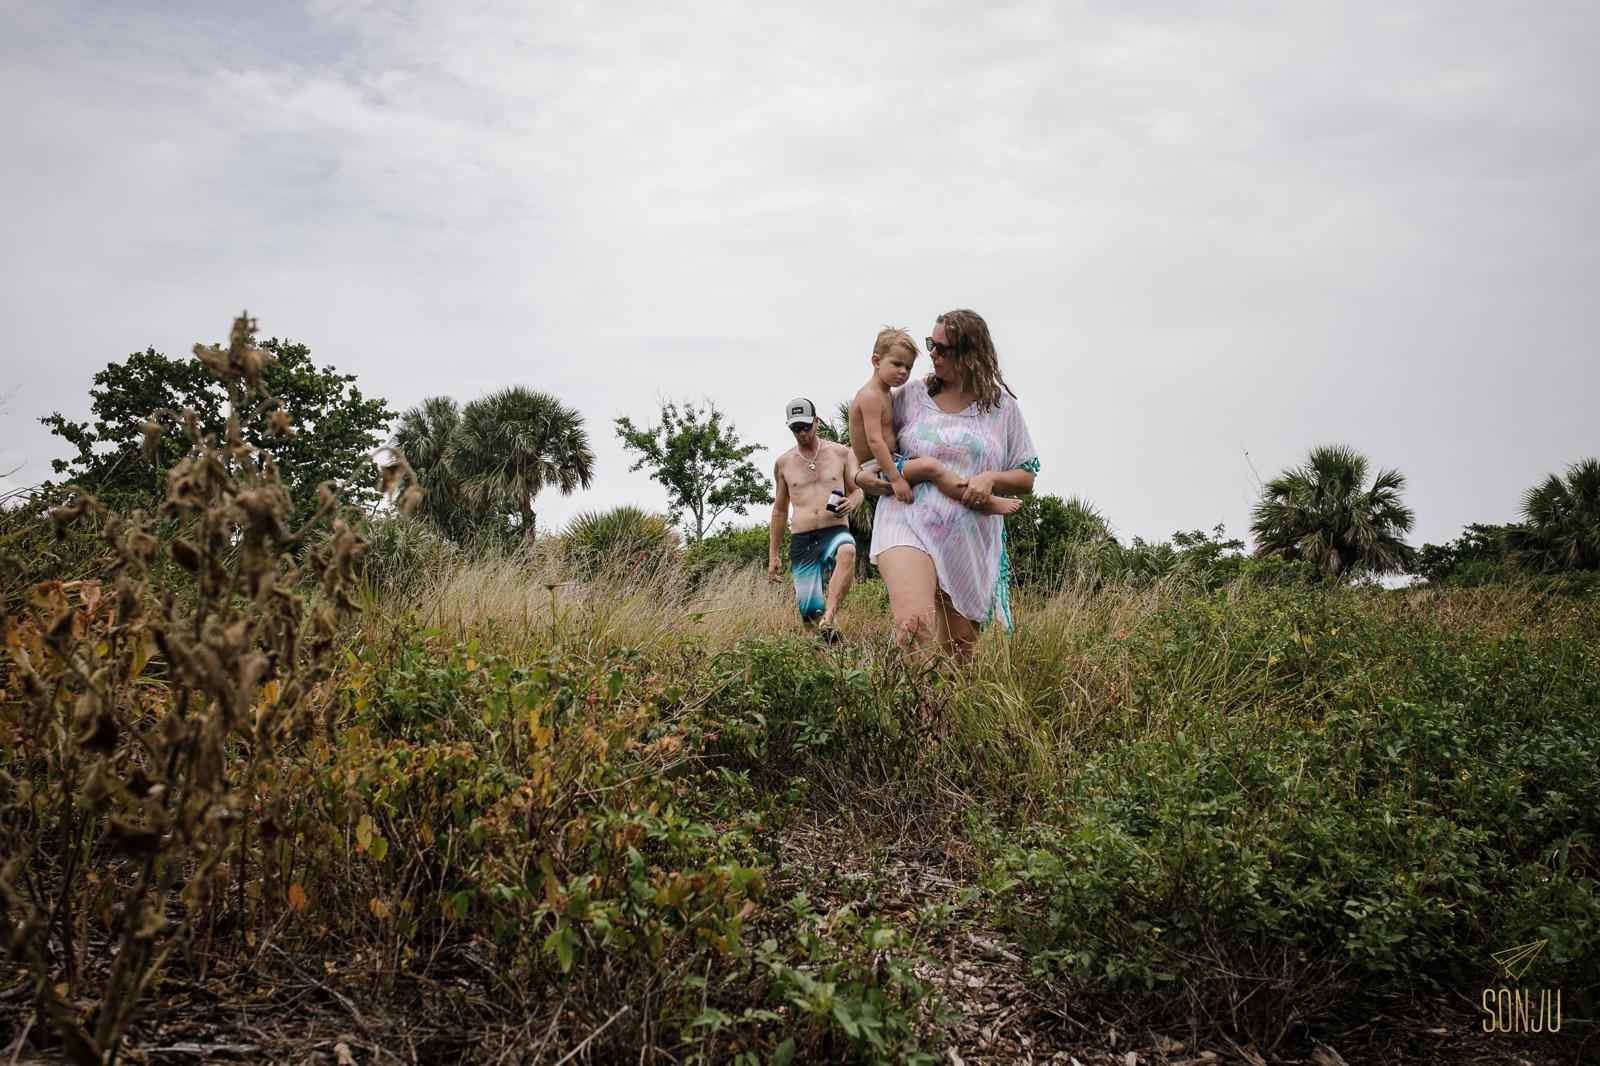 Florida-family-photography-documentary-DITL-Jupiter-Sonju00024.jpg